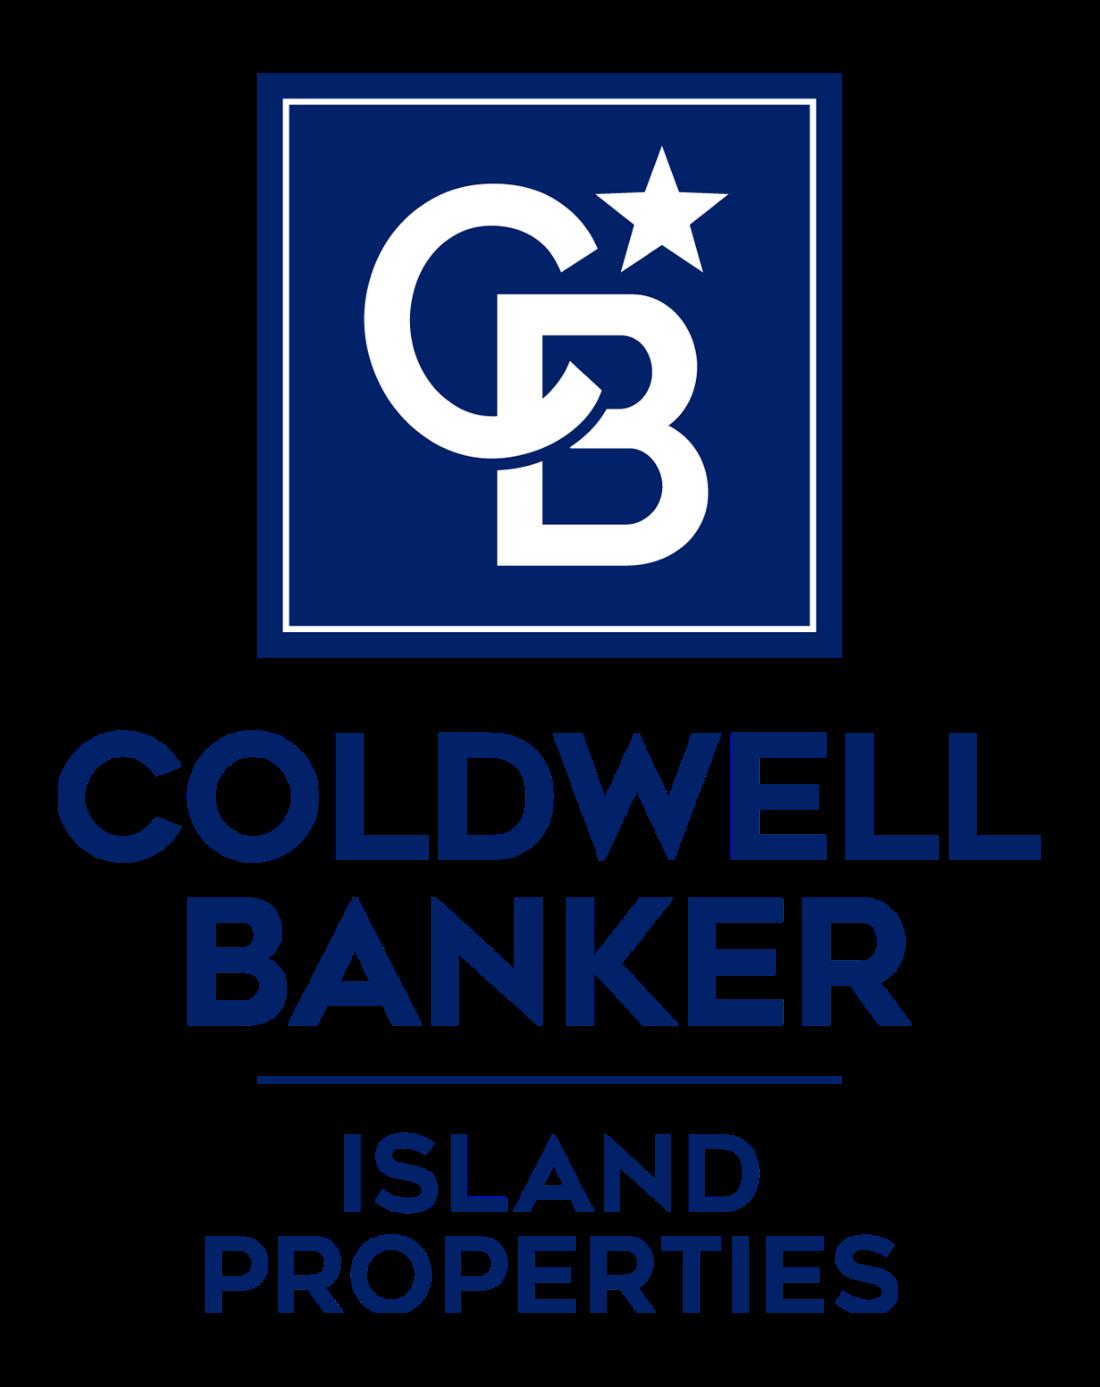 Lisa A. Mascaro - Coldwell Banker Island Properties Logo